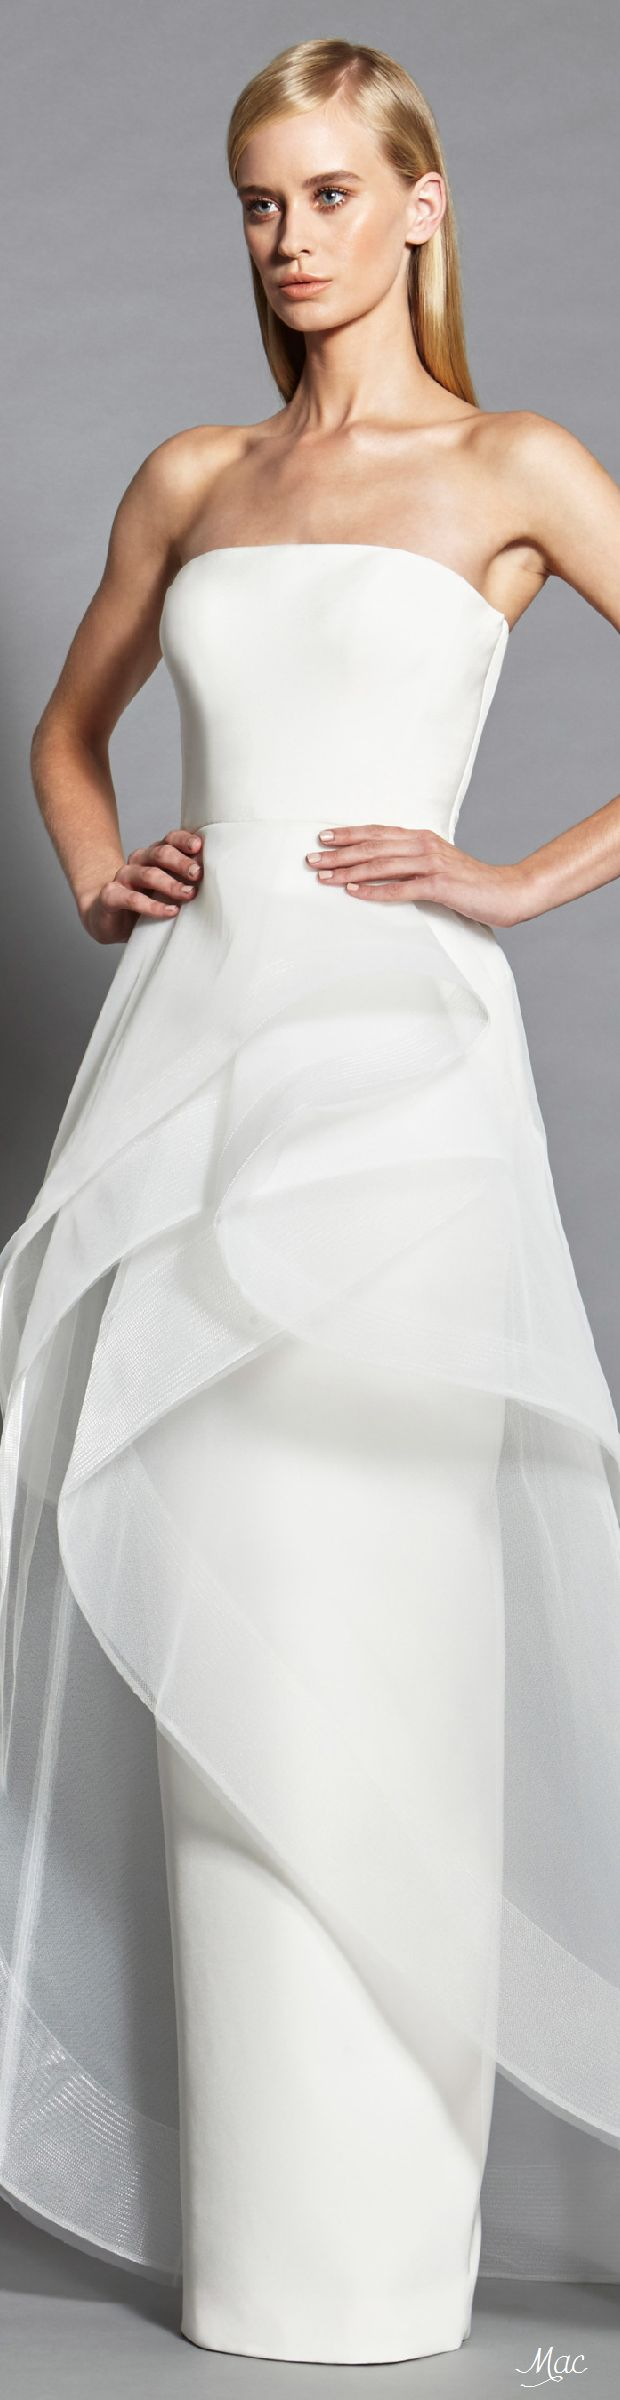 Spring 2017 Ready-to-Wear Romona Keveza